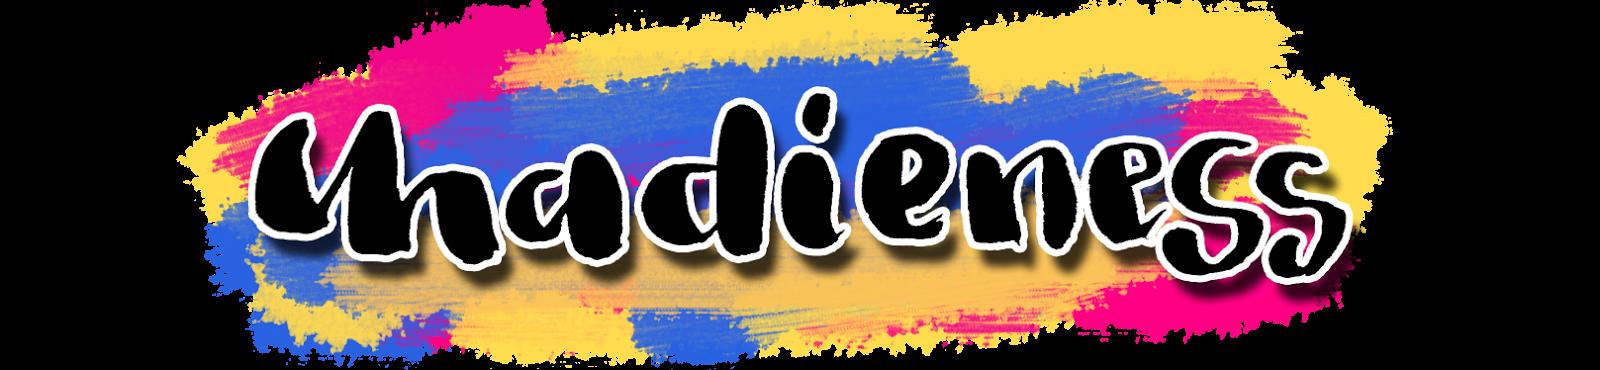 www.chadieness.com